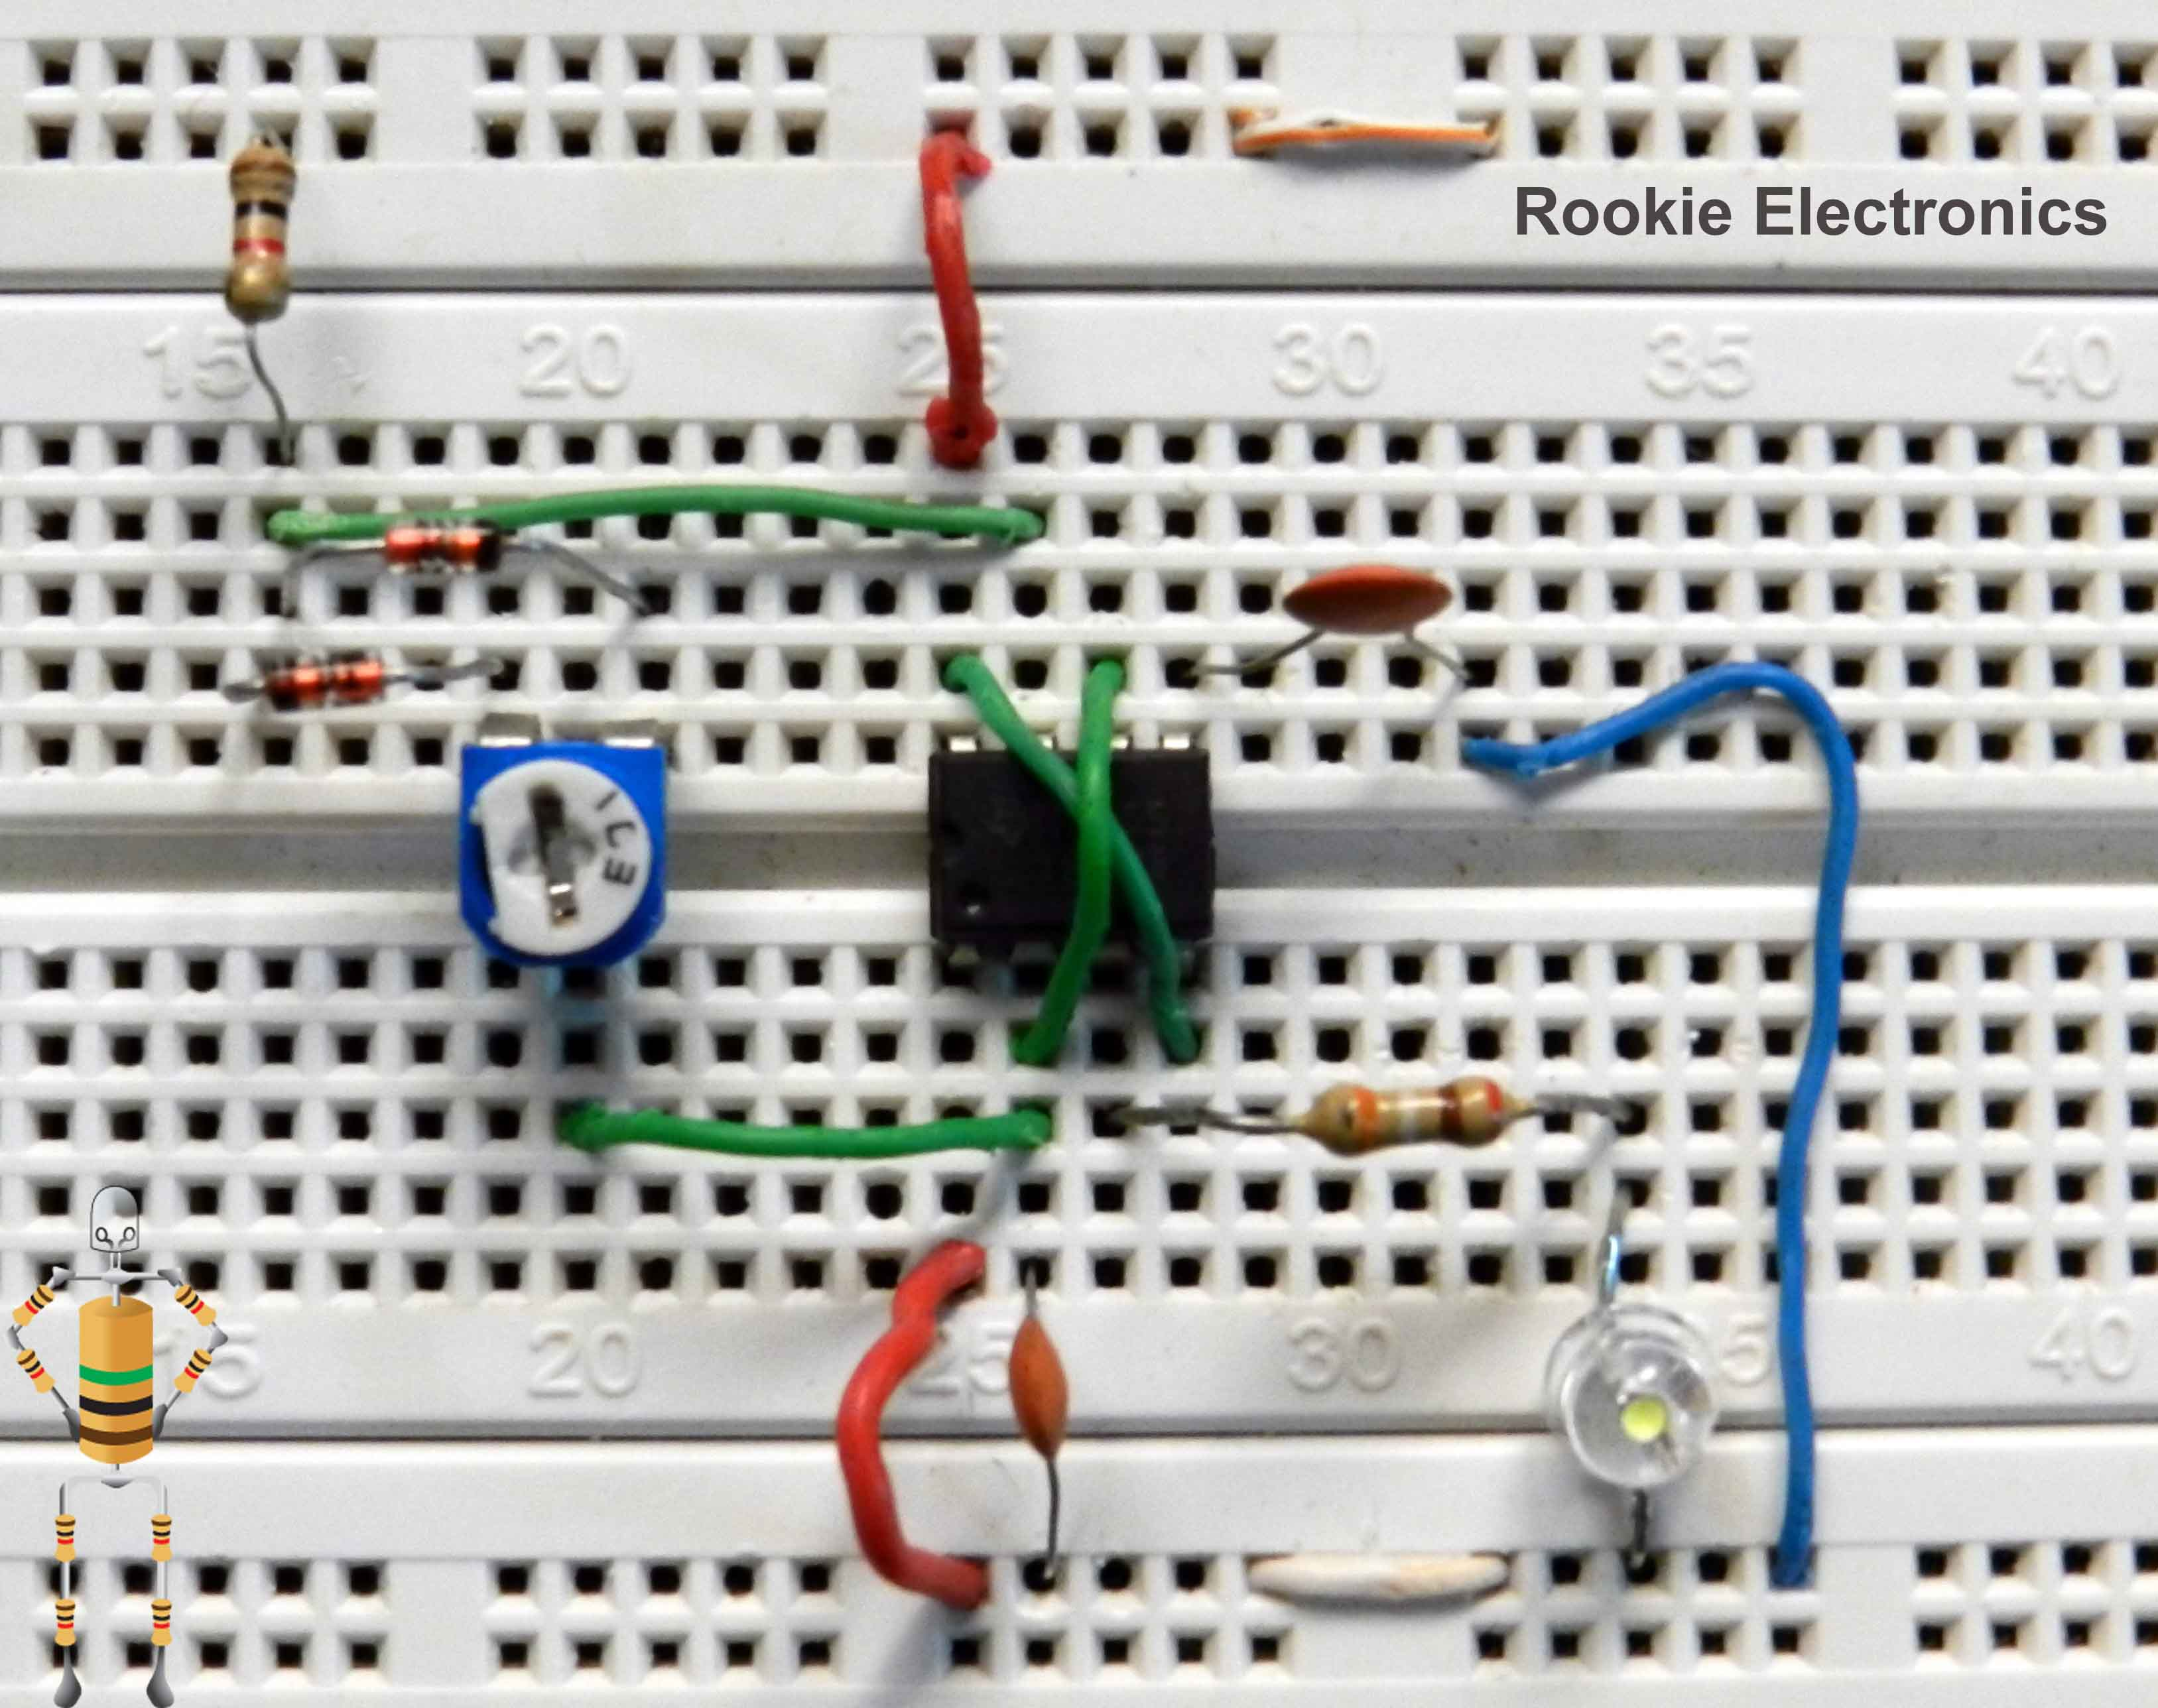 555 Timer Led Dimmer Circuit Karmashares Llc Leveraging Pwm Using Ne555 And Block Diagrams 1 Watt Project Bread Board Arrangement